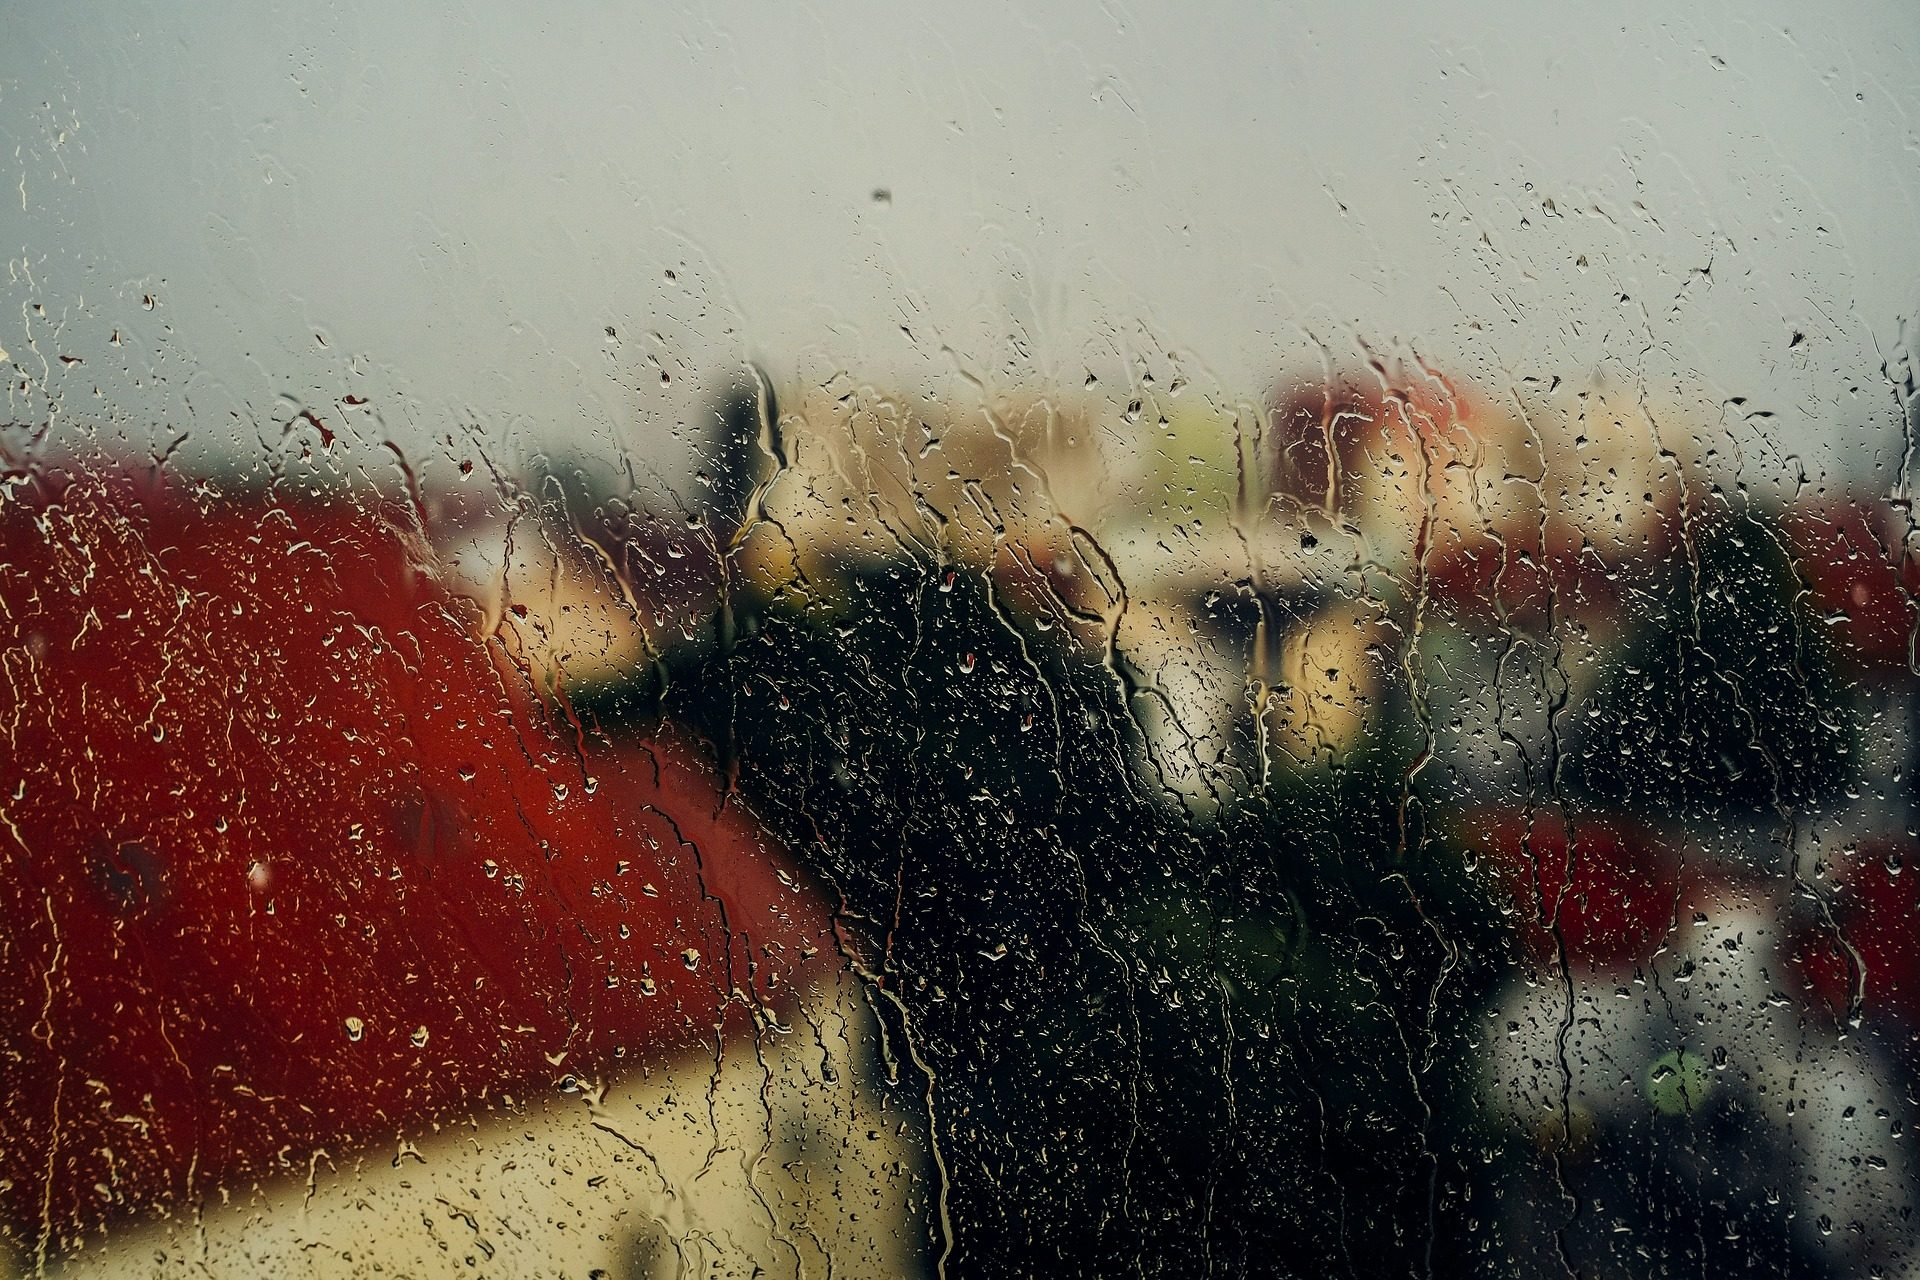 विंडो, पानी, वर्षा, बूँदें, मकान, फजी, ध्यान से बाहर - HD वॉलपेपर - प्रोफेसर-falken.com